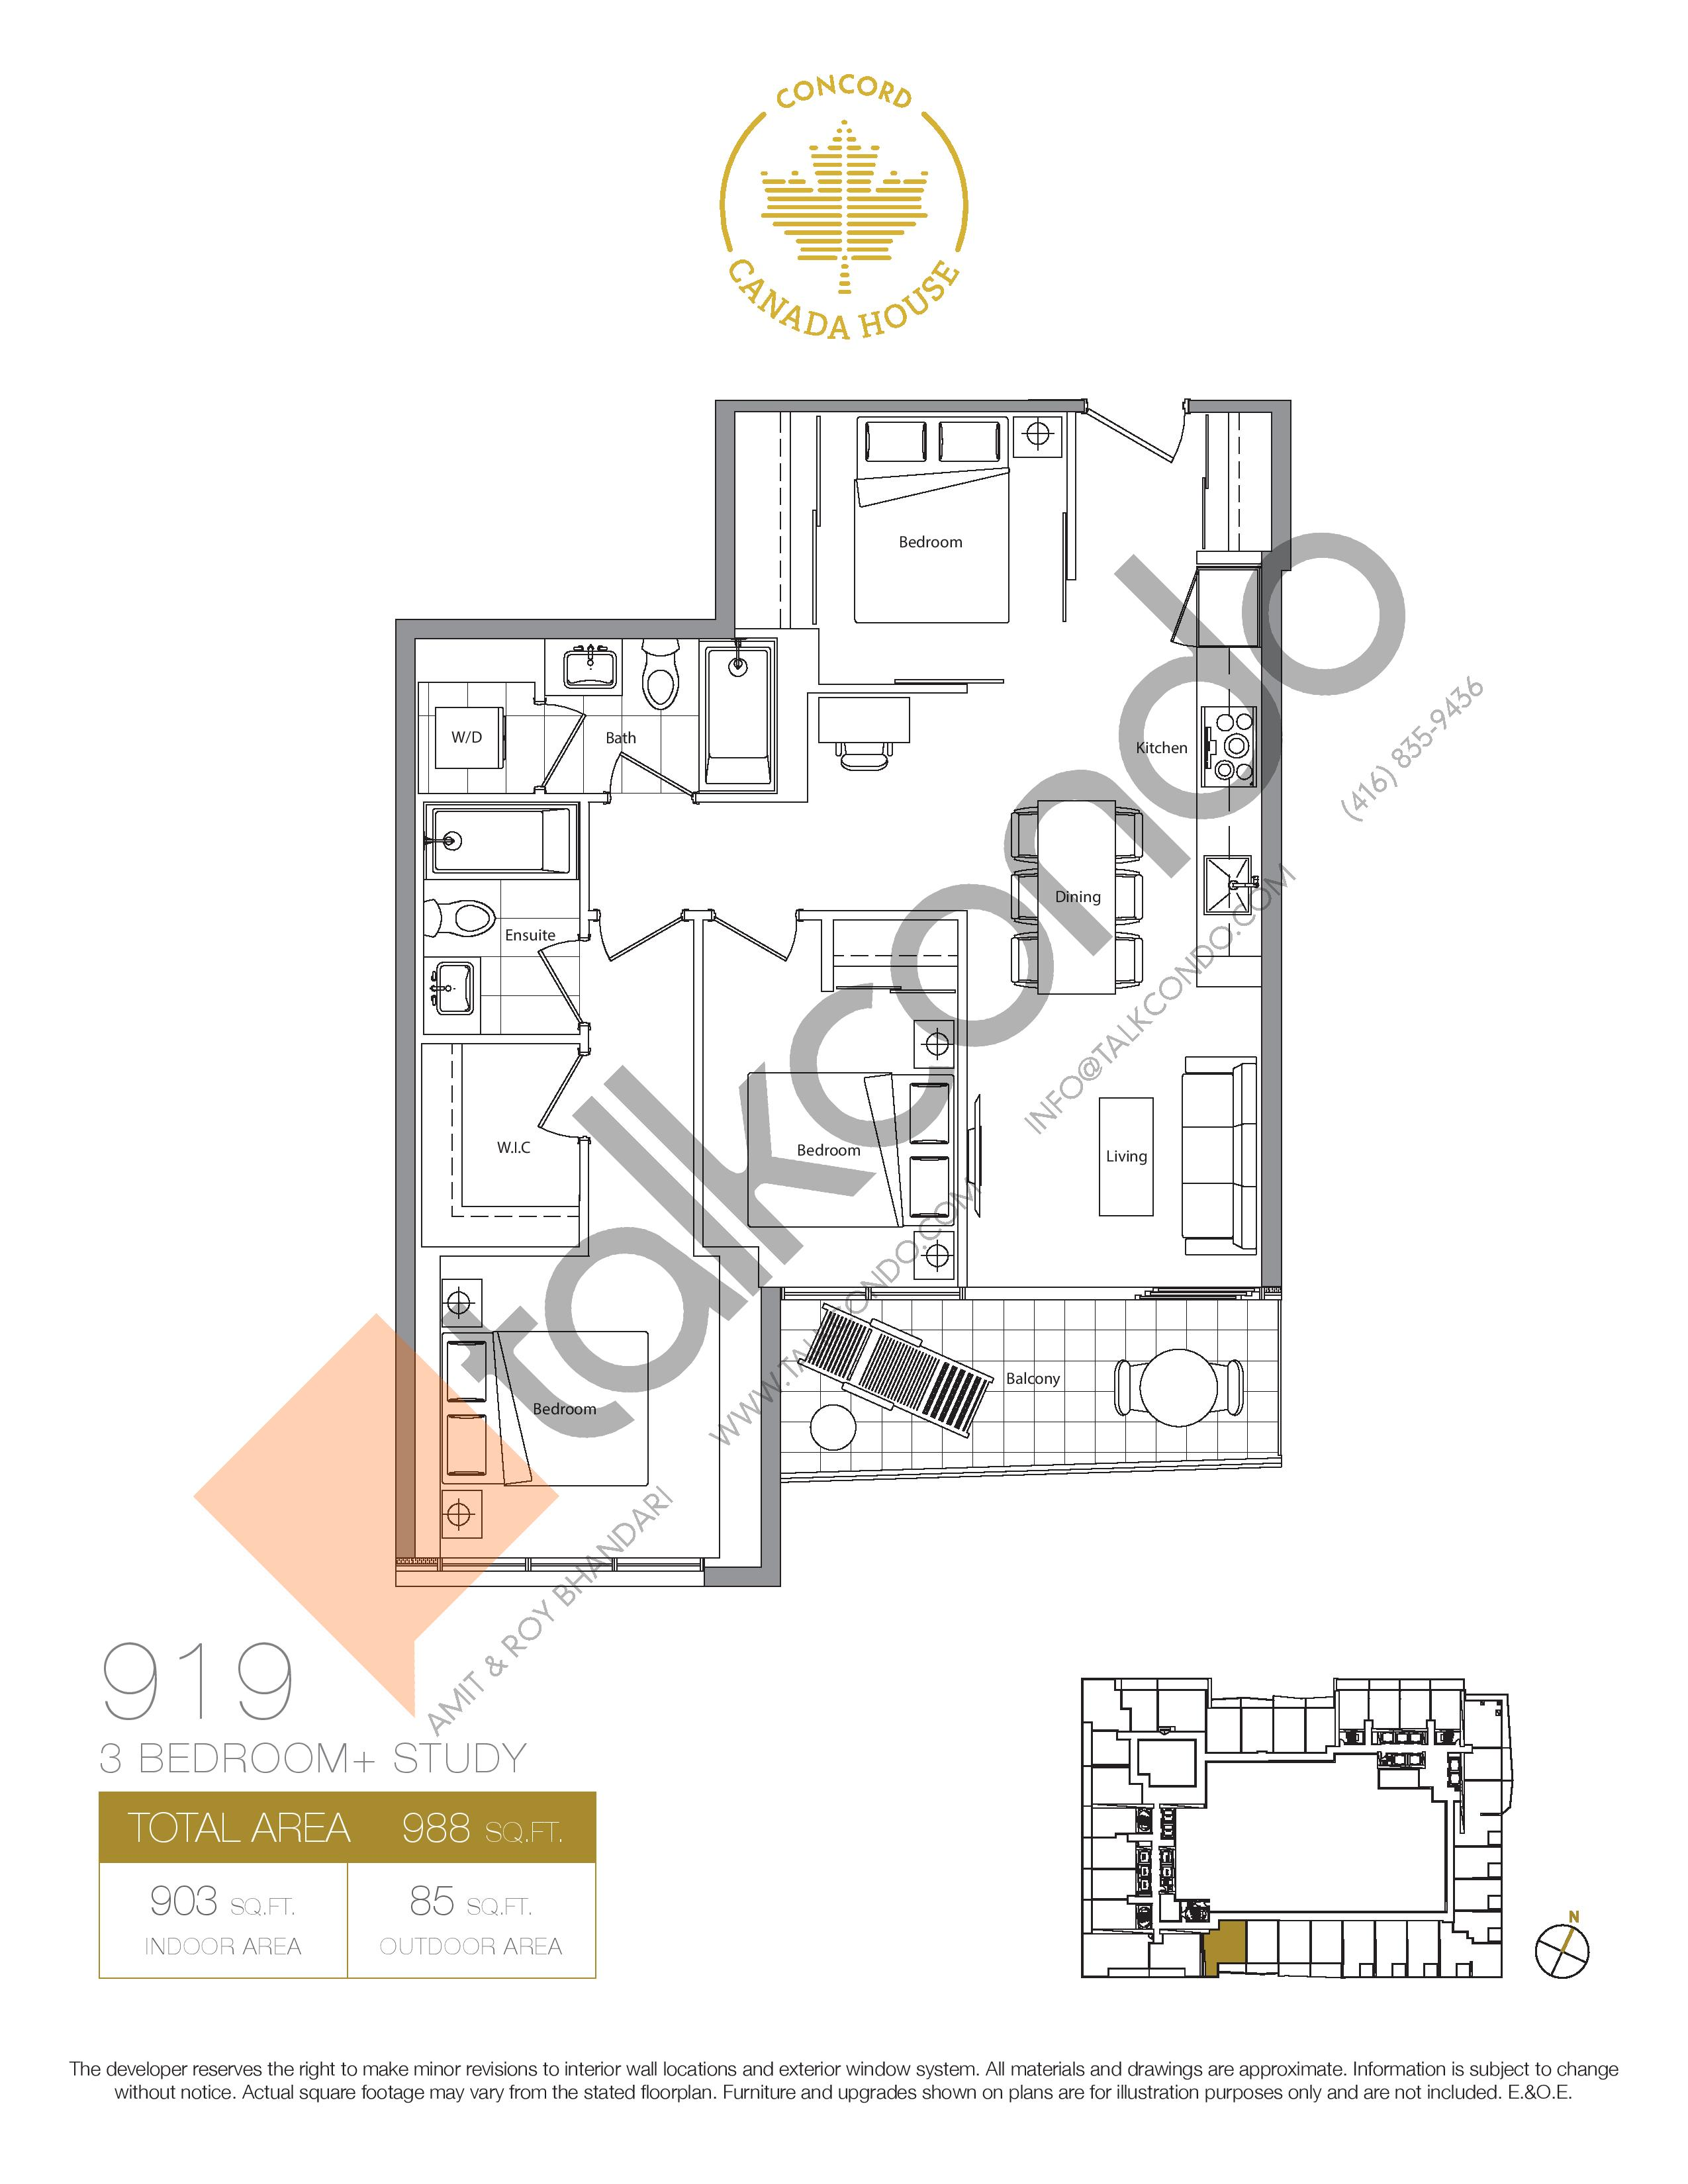 919 (Podium) Floor Plan at Concord Canada House Condos - 903 sq.ft